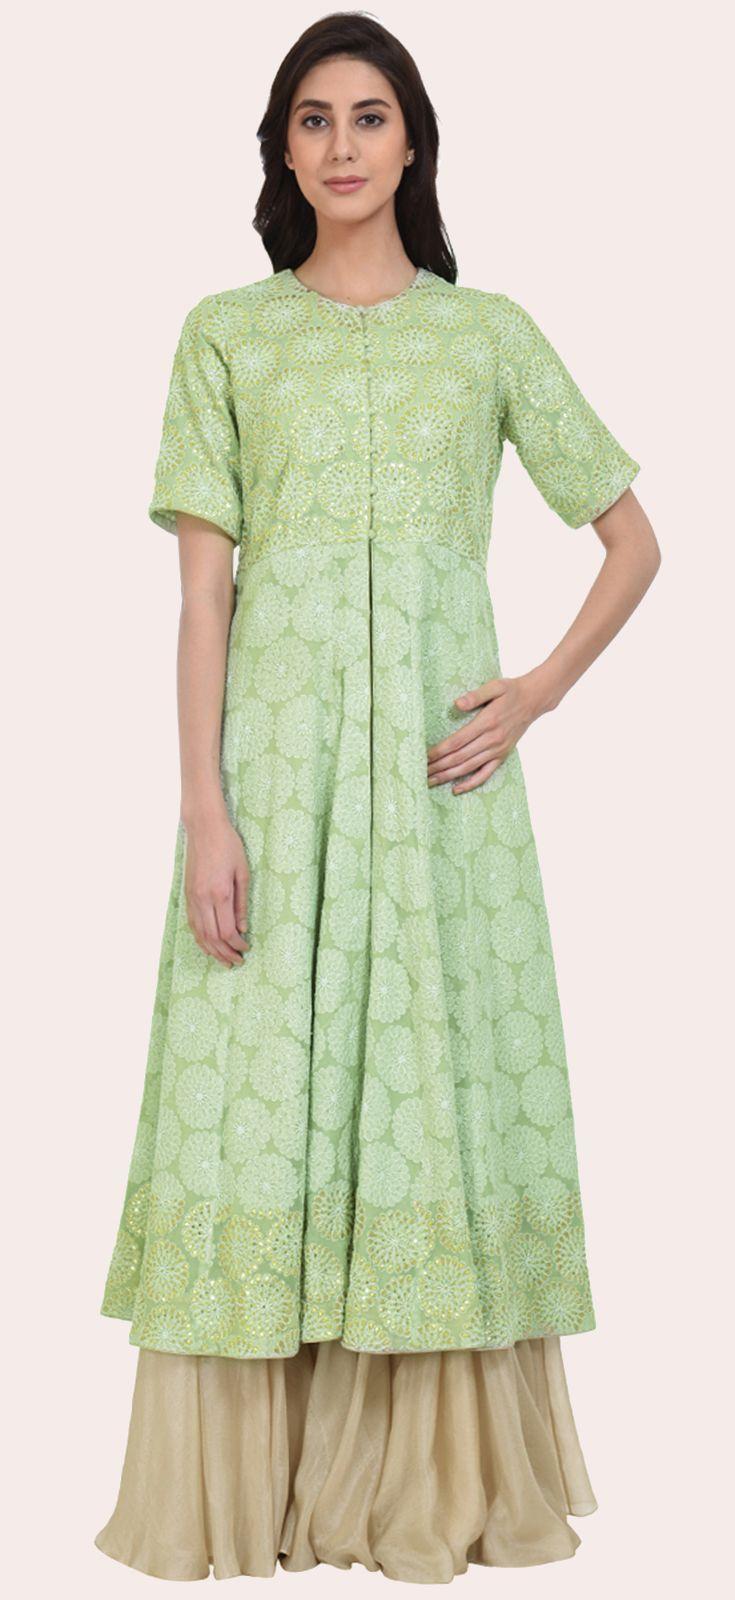 Eid 2017 Collection: Sage Green Hand Embroidered Chikankari And Gota Patti Kalidaar Dress